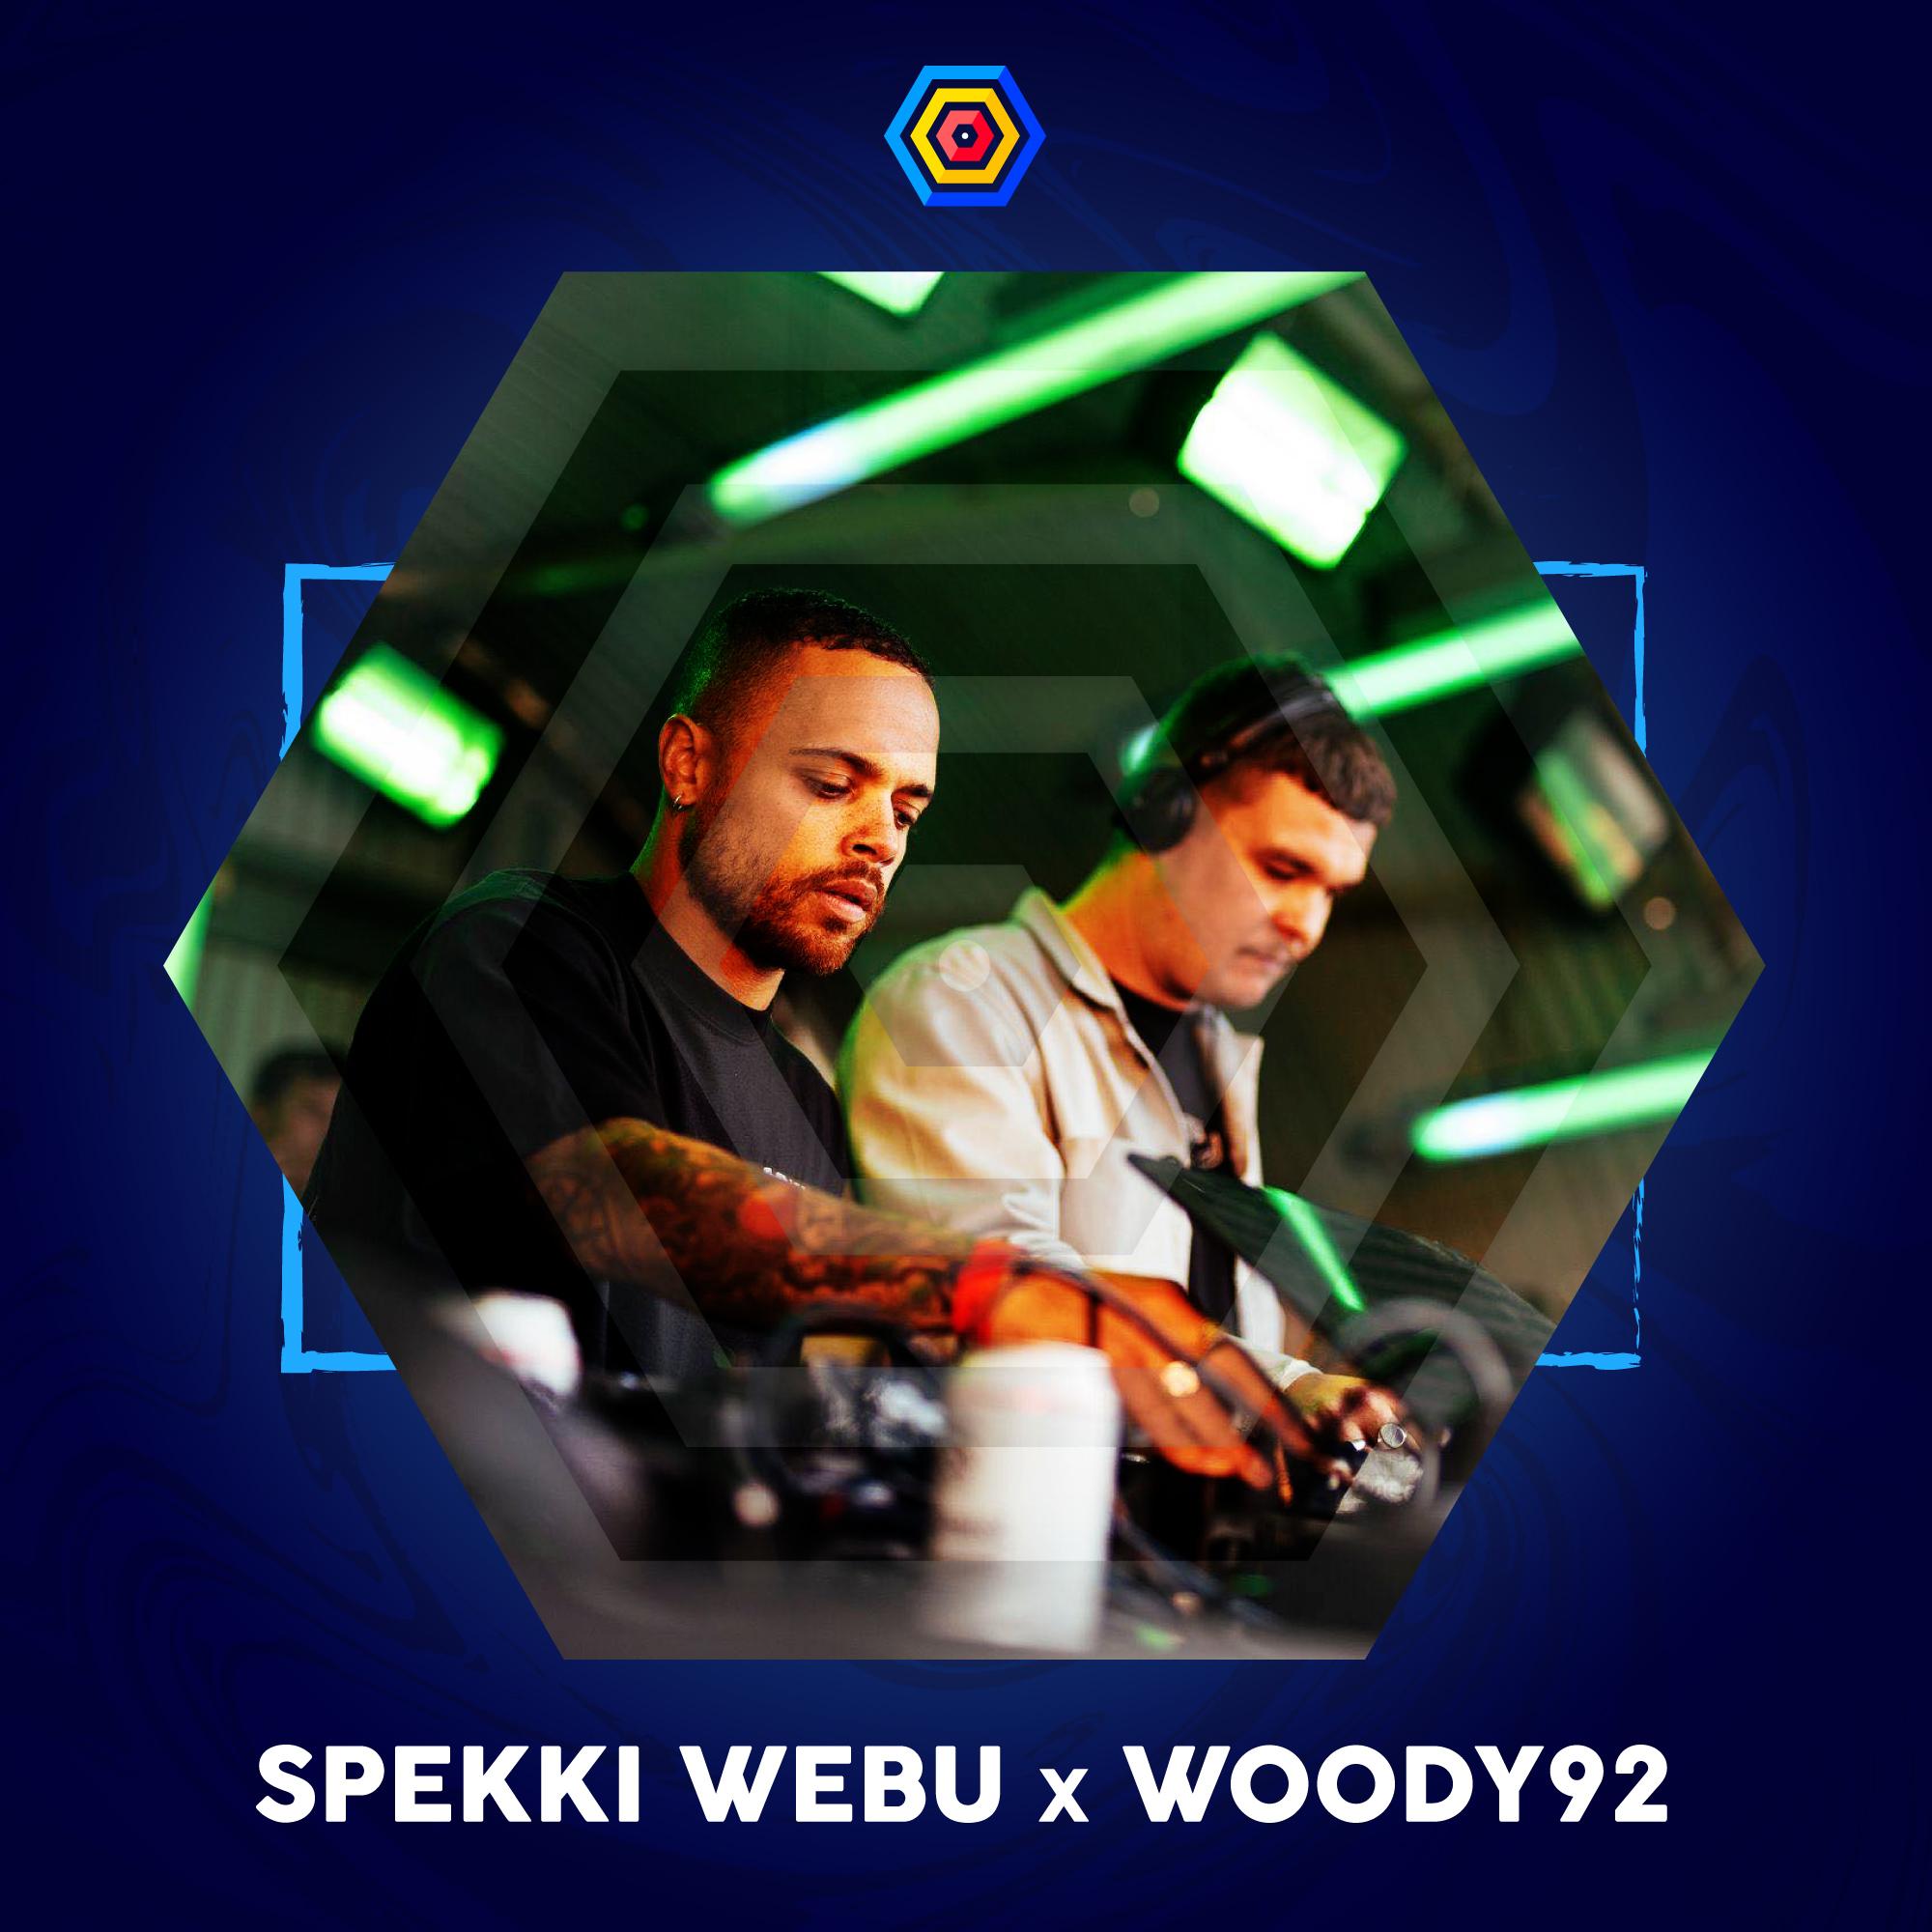 Spekki-webu-x-Woody'92